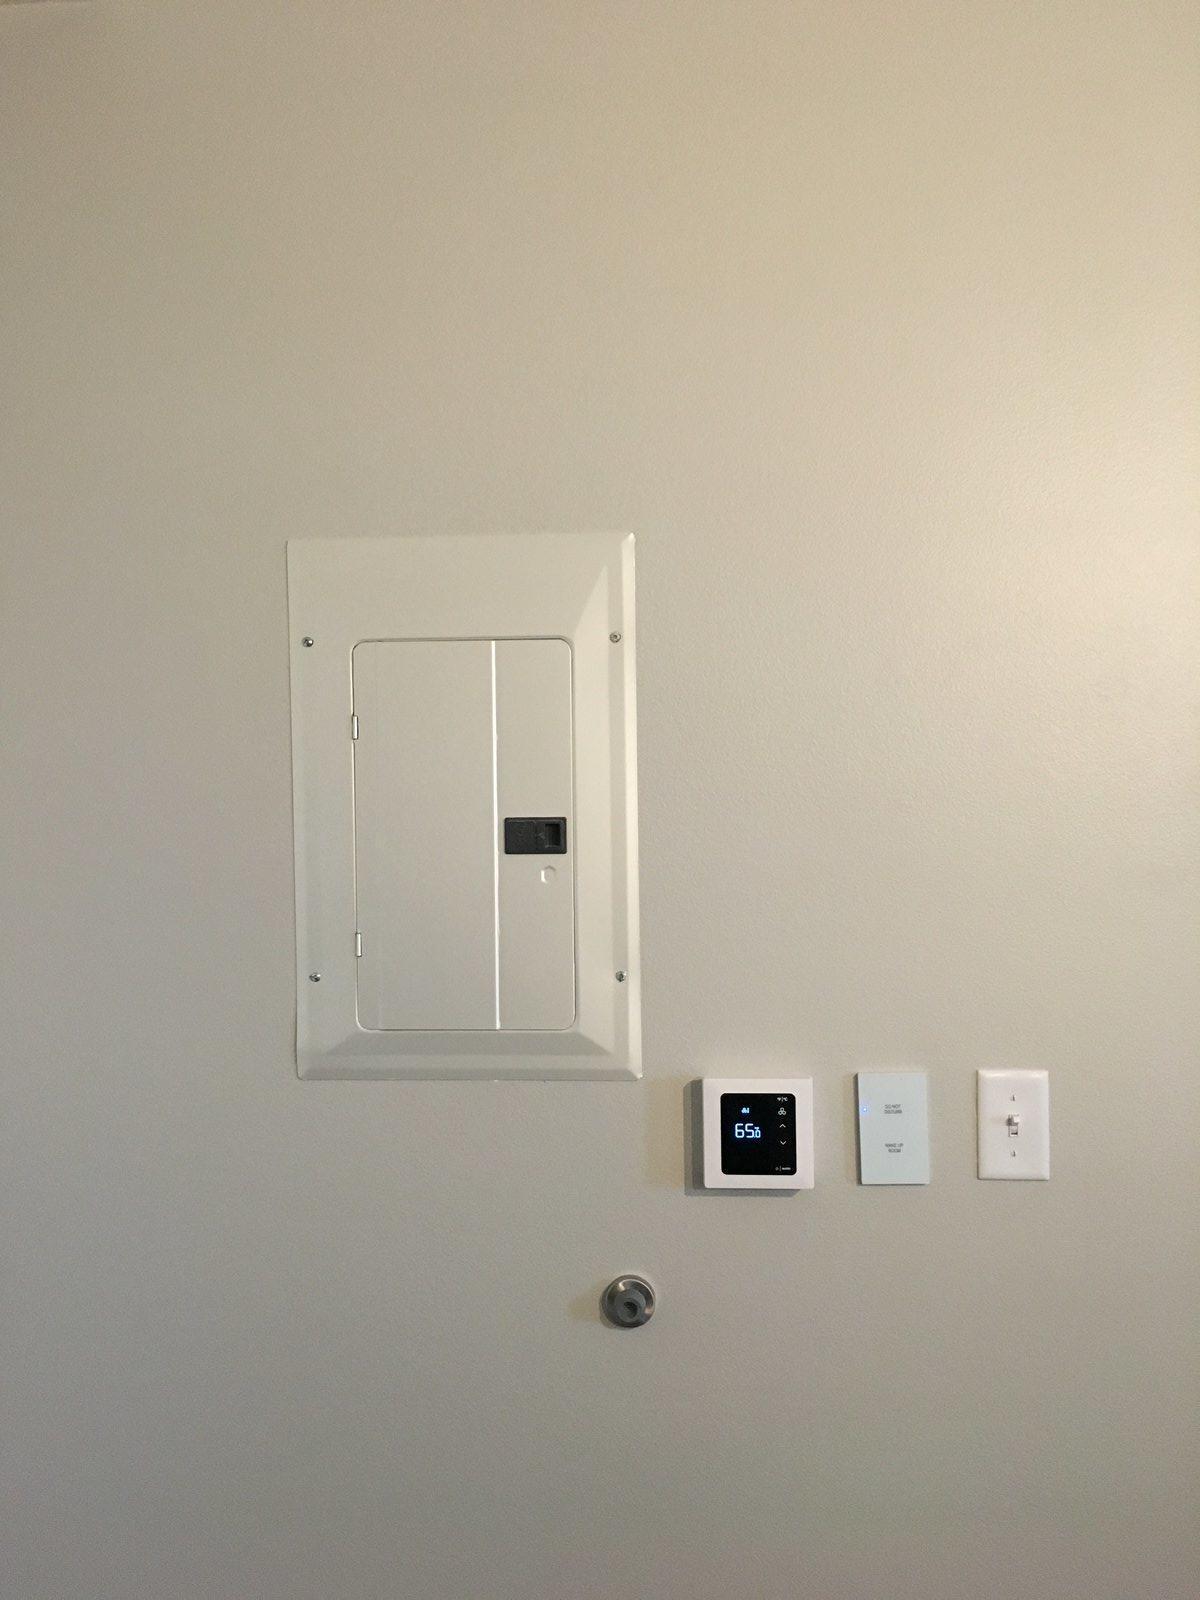 Healdsburg Suites Guestroom Thermostat